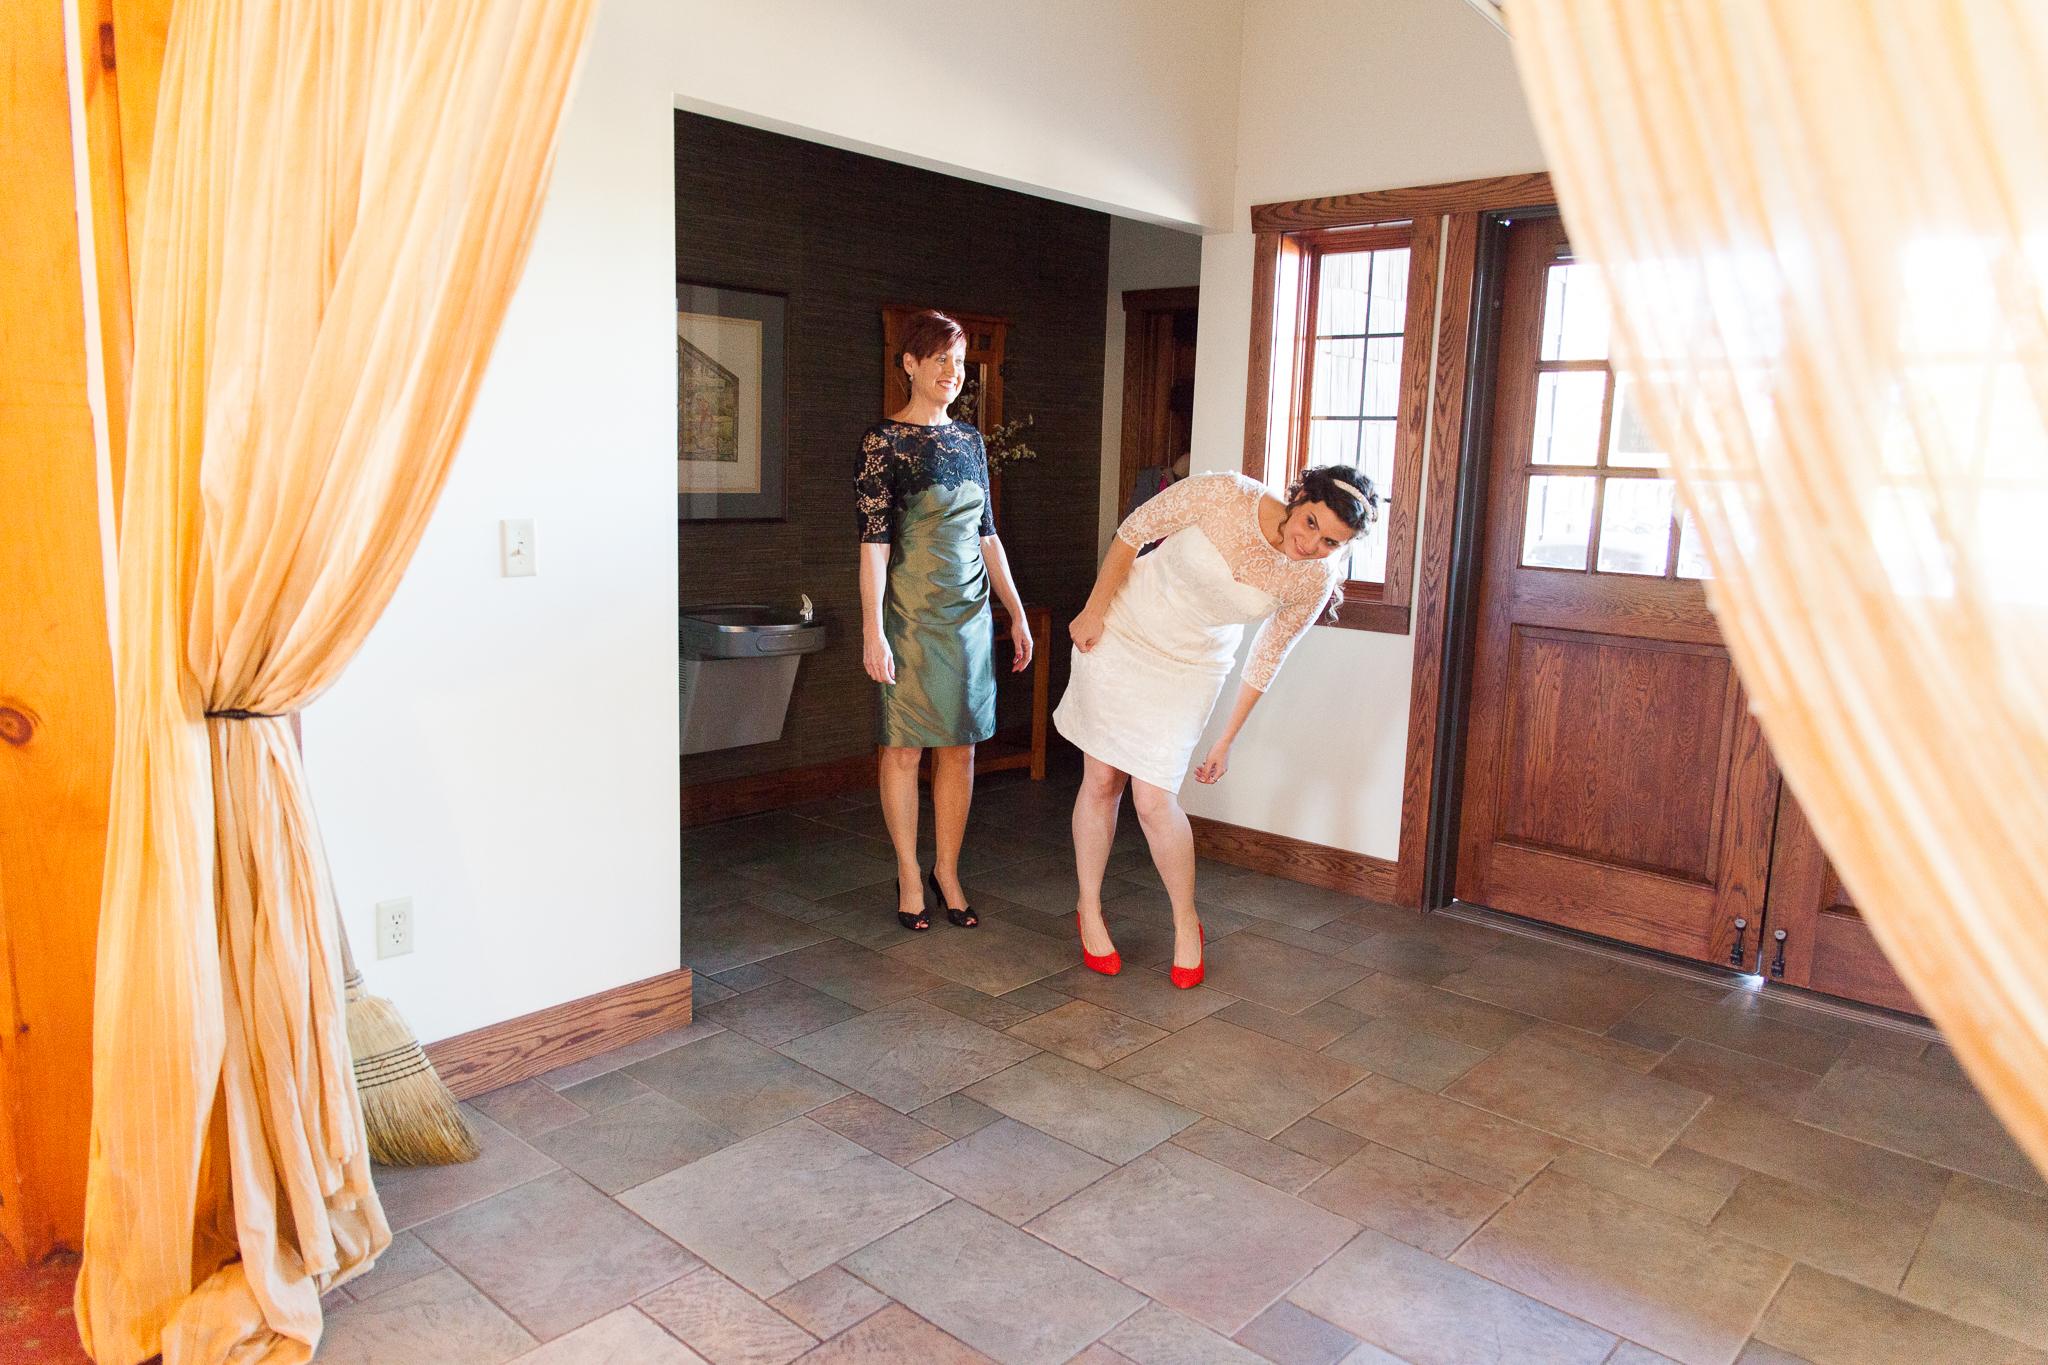 camuglia-whomstudio-chelsea_and_andy-nycphotographer-wedding-brooklyn-buffalo-timberlodge-011-0031.jpg